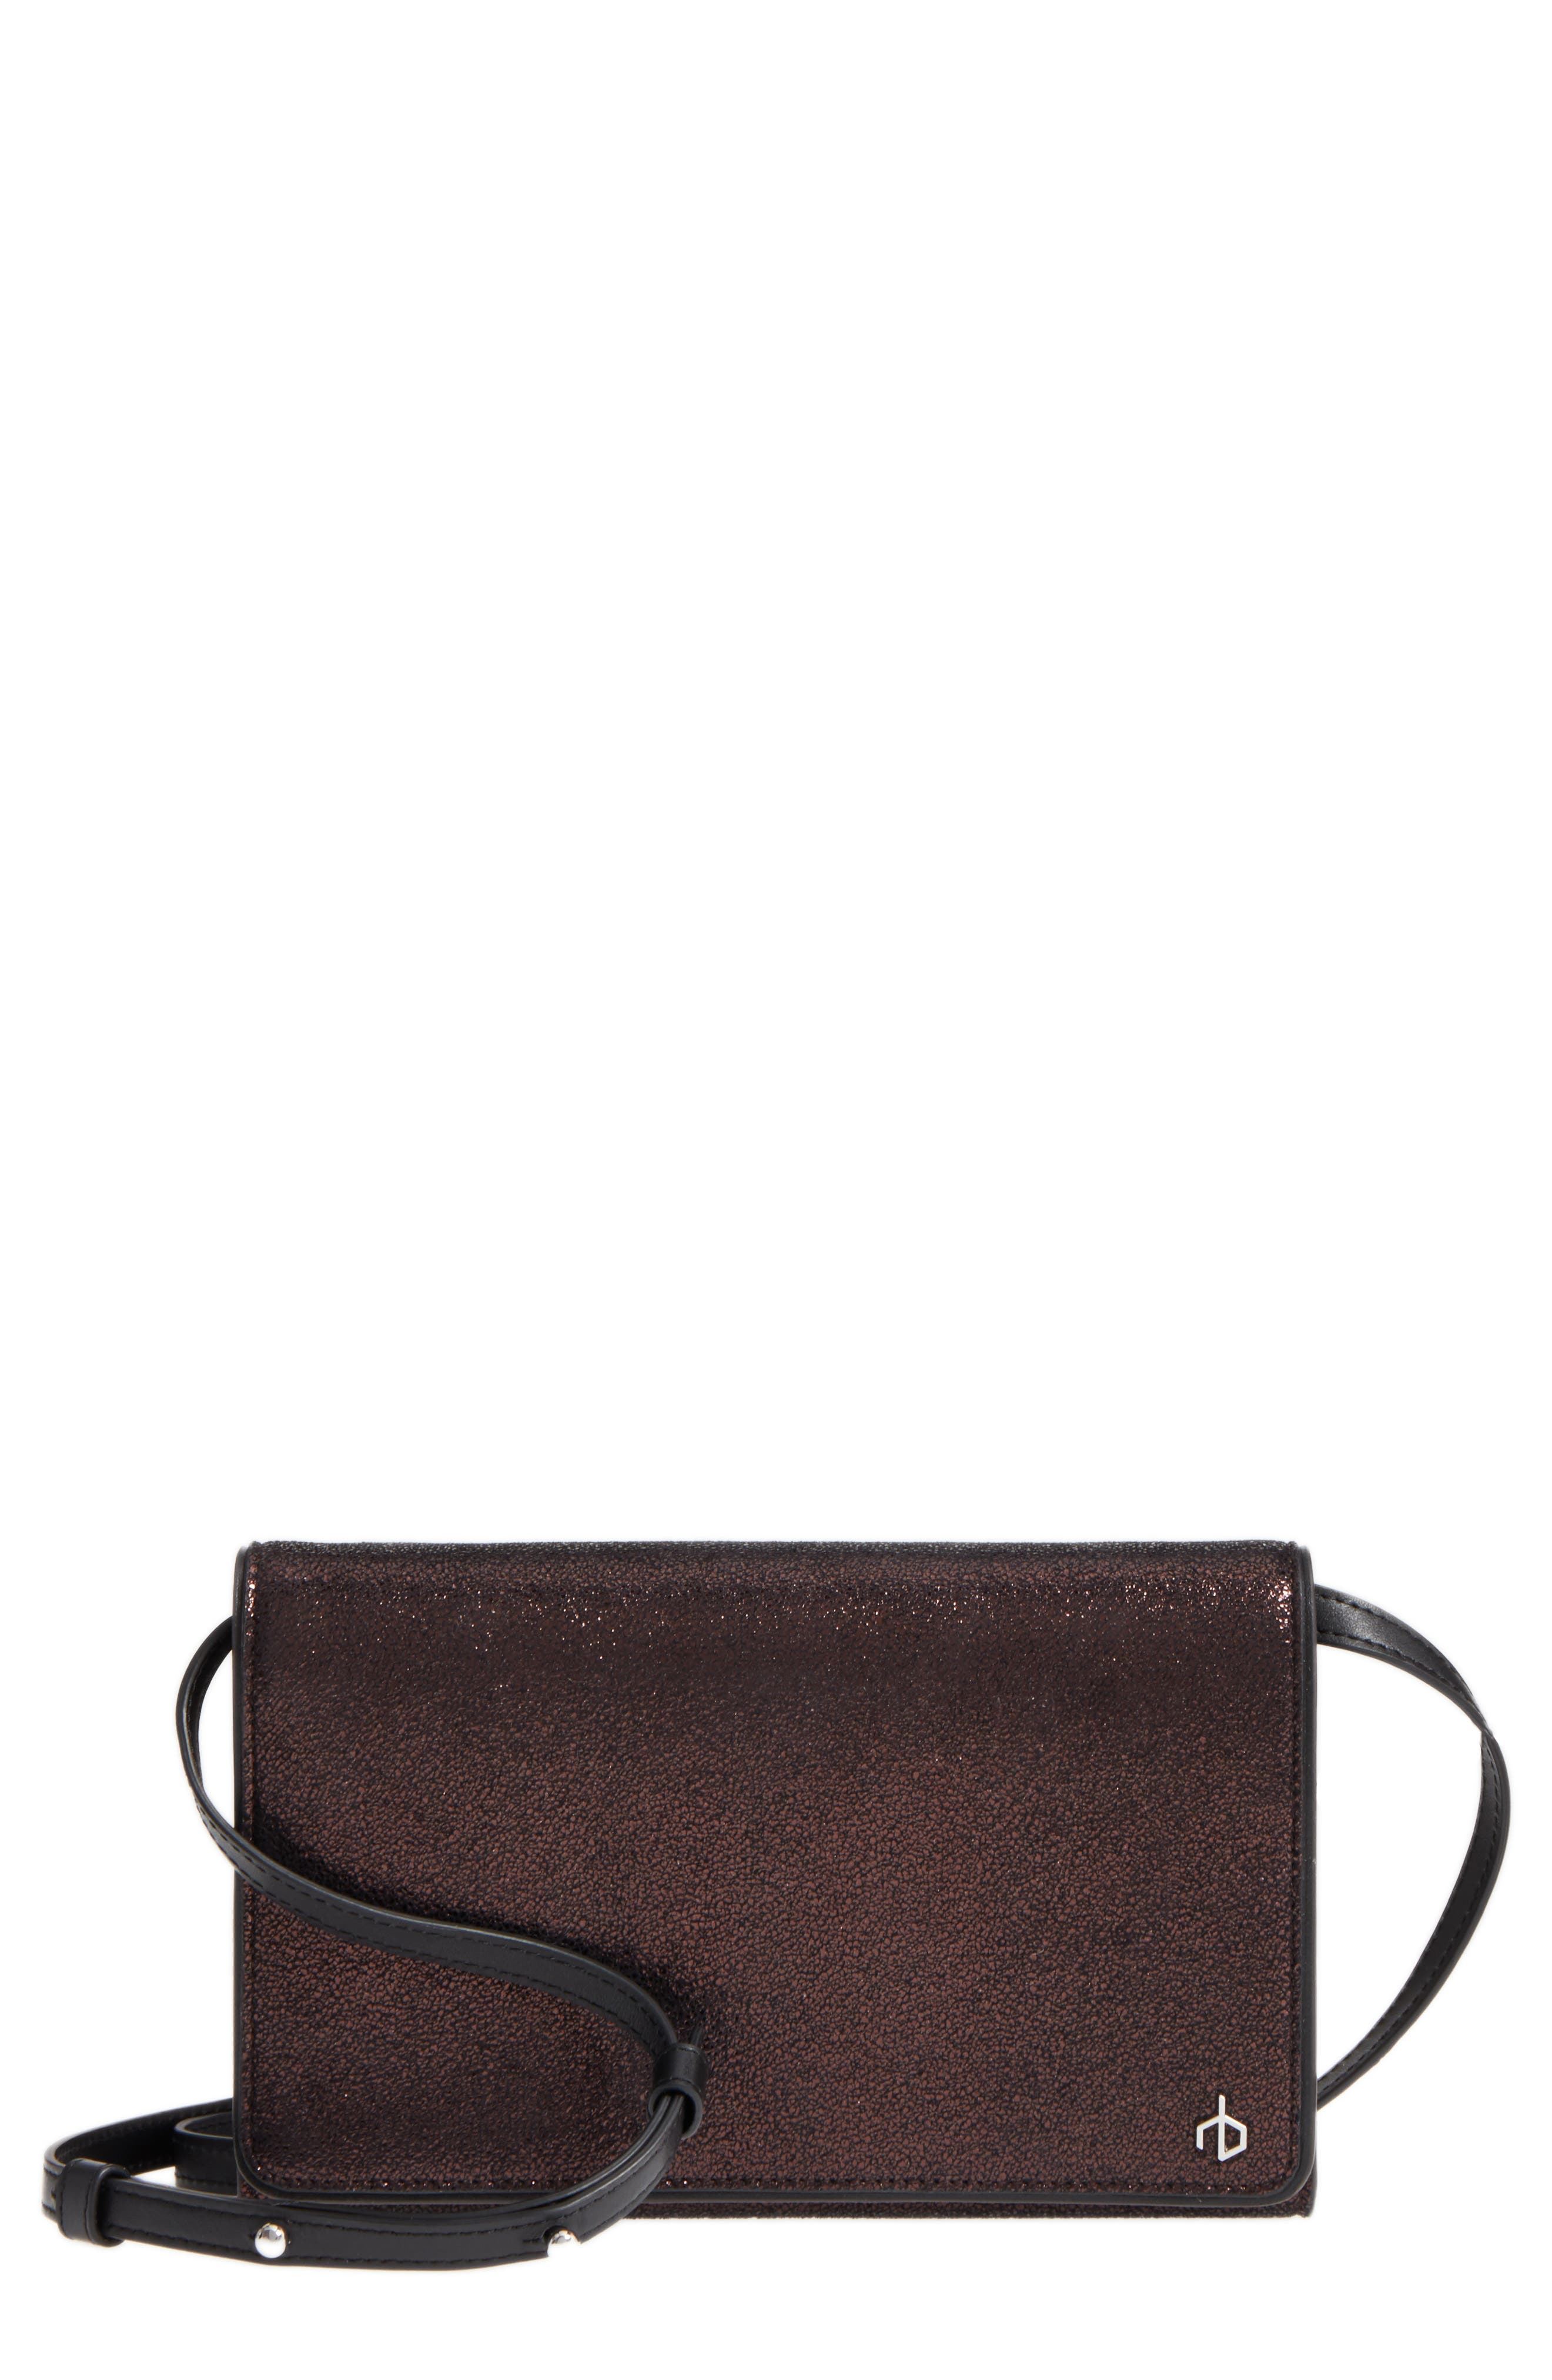 Metallic Leather Crossbody Wallet,                             Main thumbnail 1, color,                             Copper